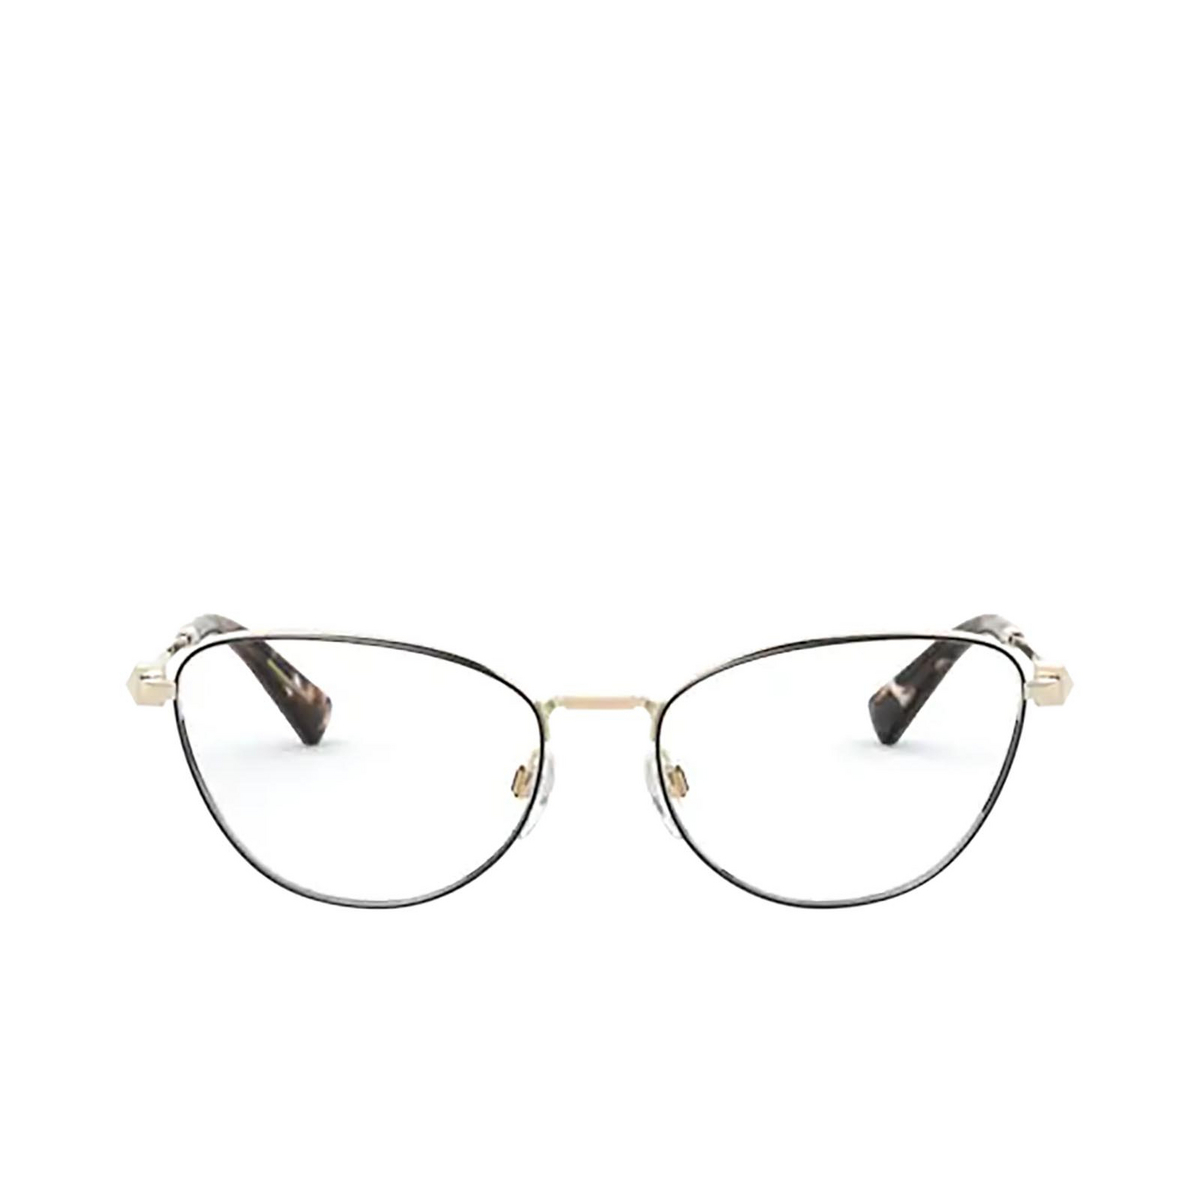 Valentino® Cat-eye Eyeglasses: VA1016 color Pale Gold / Black 3053 - front view.